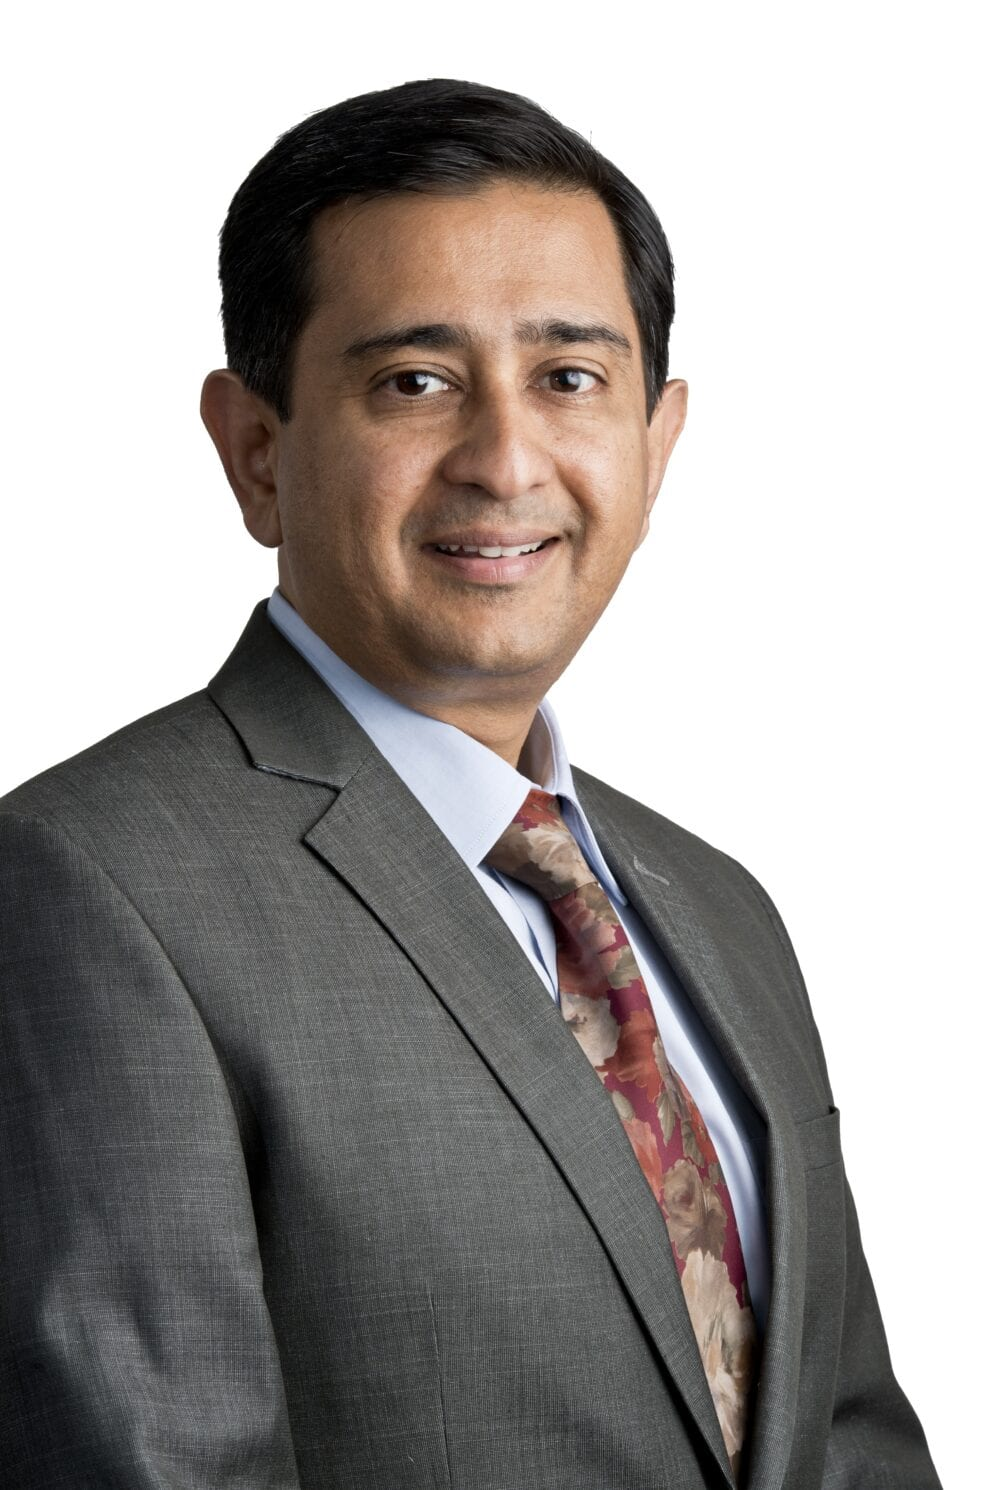 Sumeet Walia, Chief Sales and Marketing Officer, Tata Communications